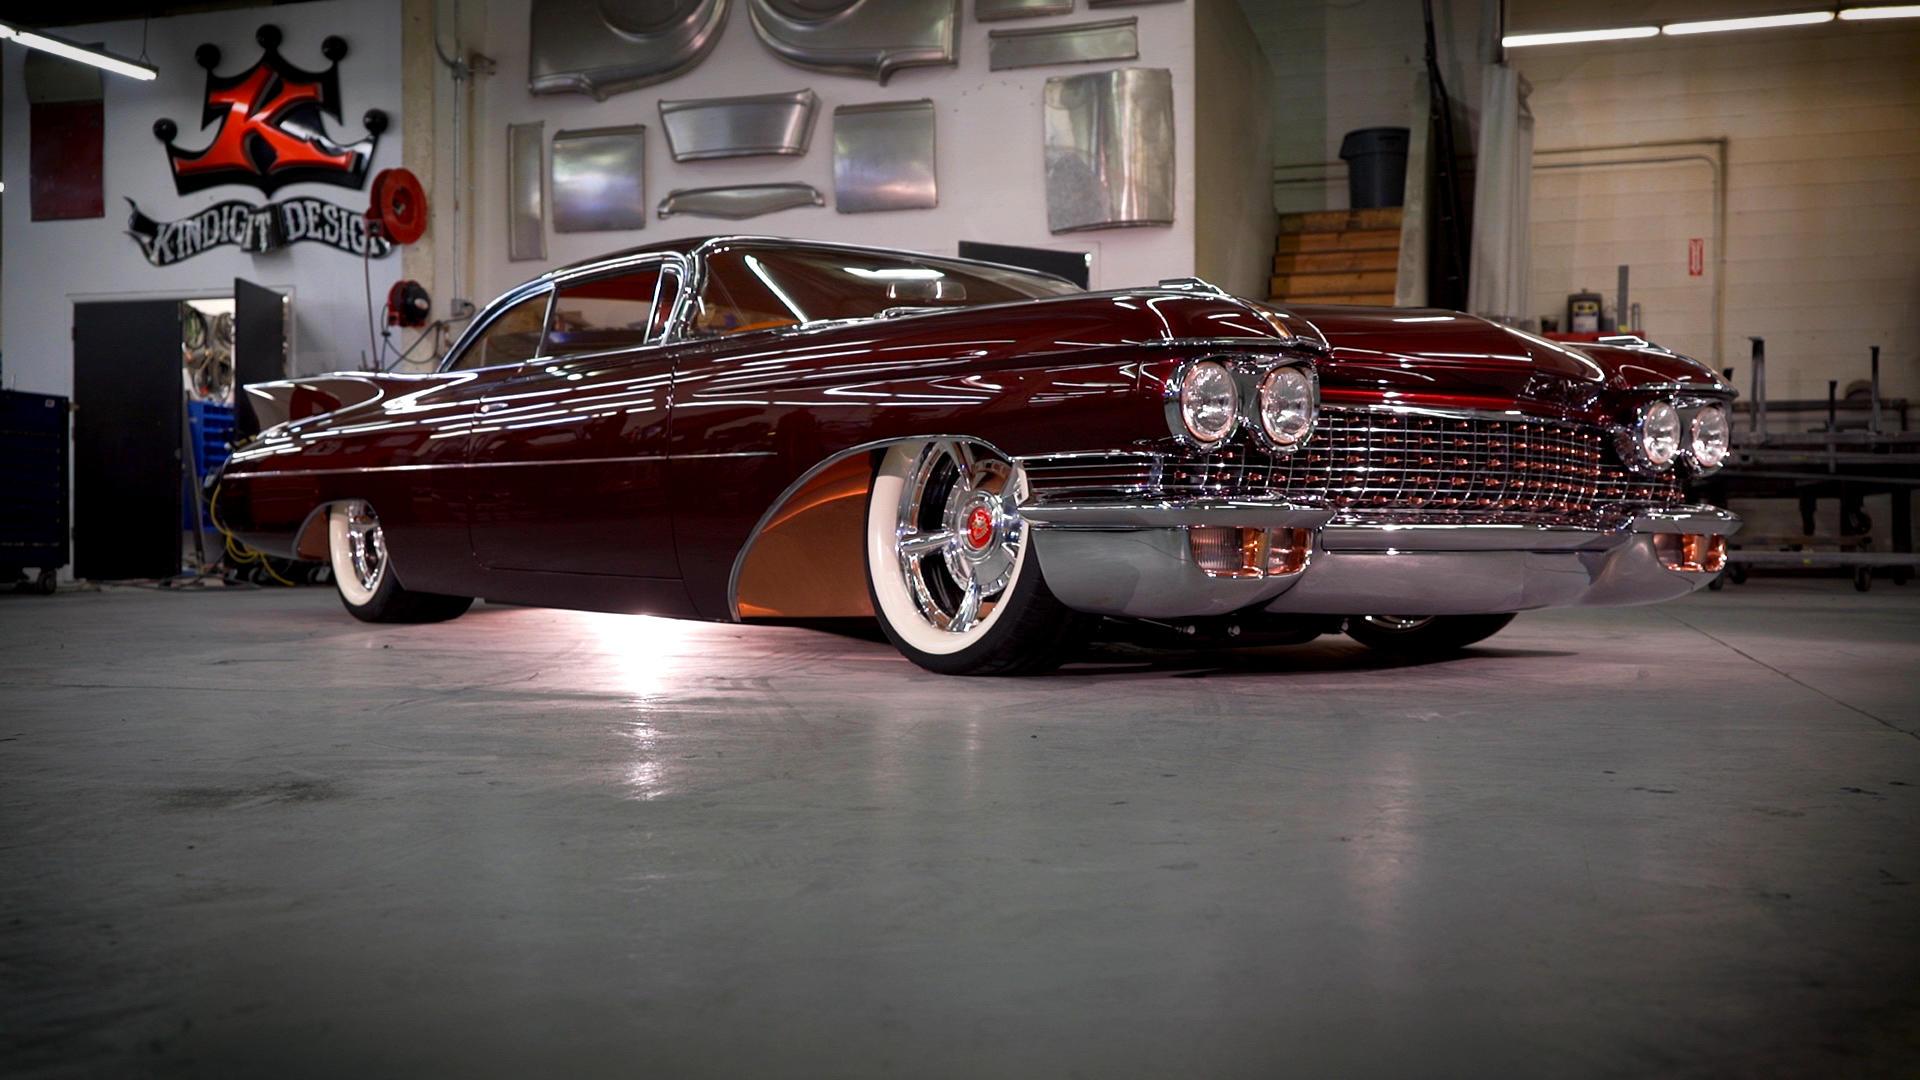 Cadillac Convertible 2015 >> Copper caddy cost kindig it cadillac